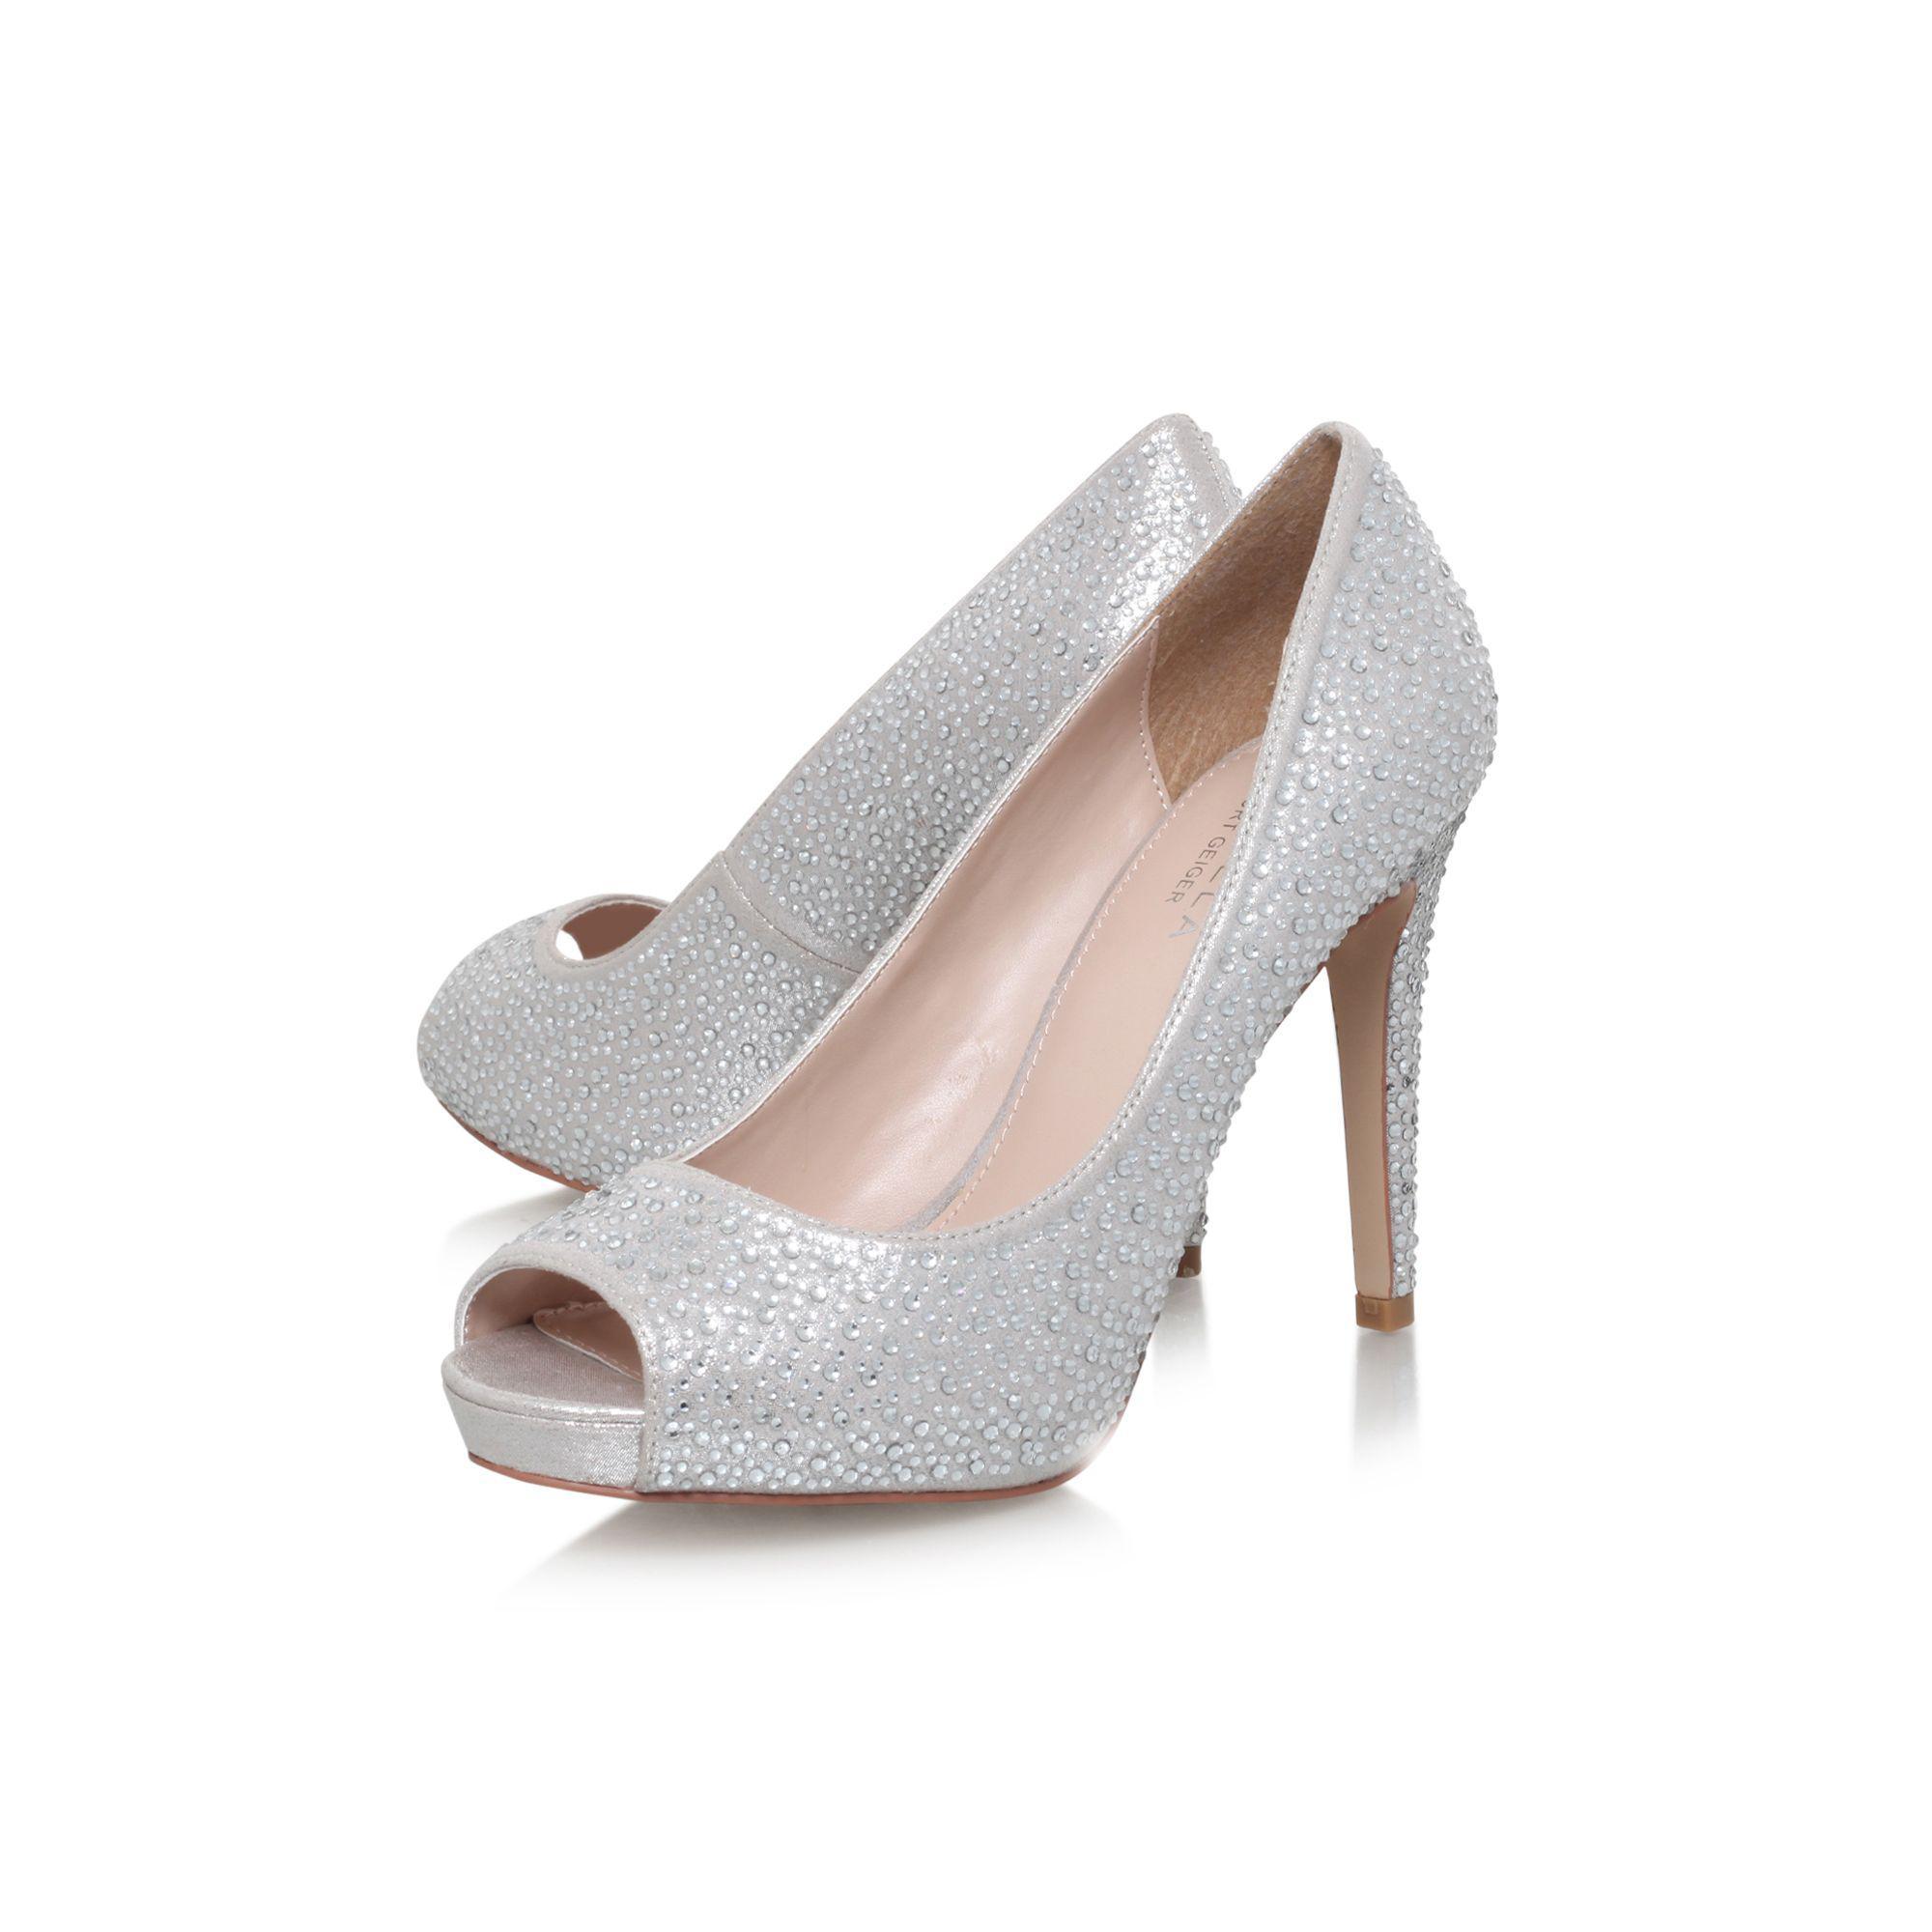 5ed2195d4f Carvela Kurt Geiger - Metallic Silver 'lara' Jewel High Heel Court Shoe -  Lyst. View fullscreen